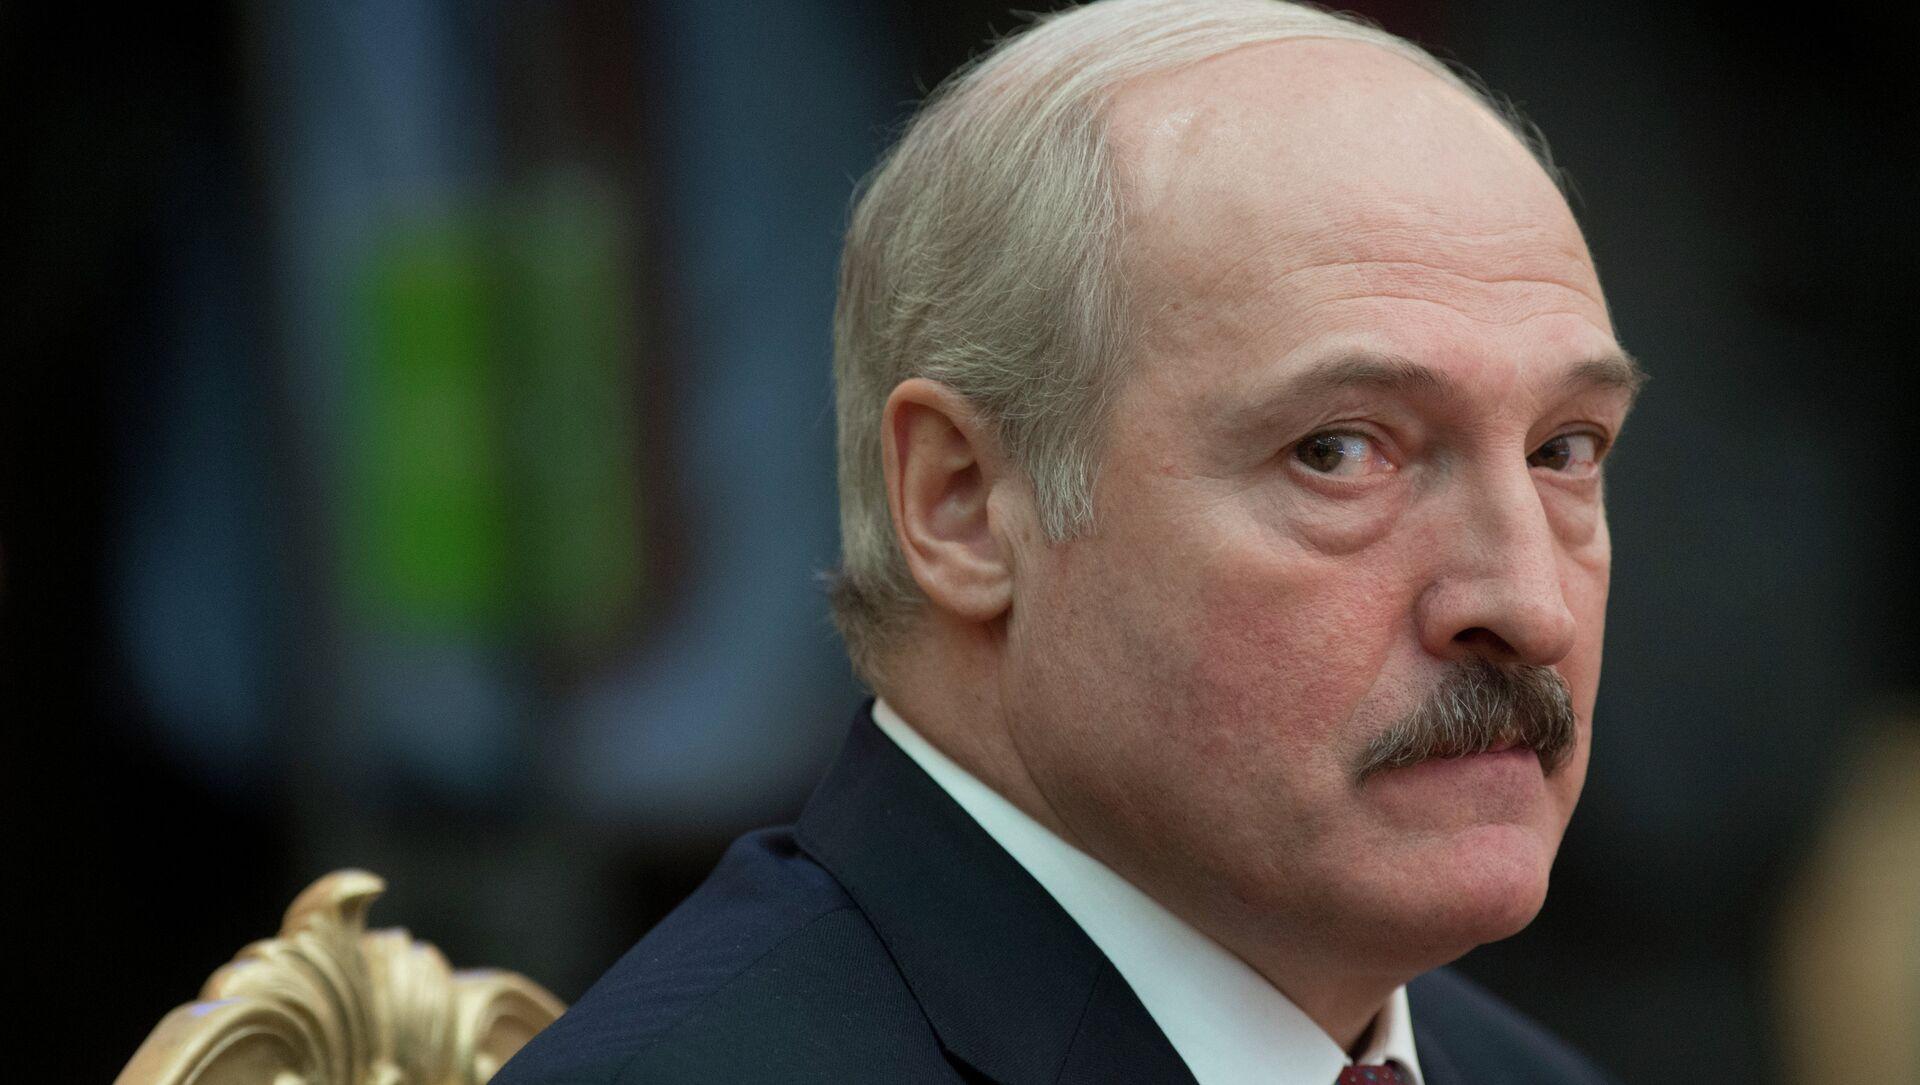 Il presidente della Bielorussia Alexander Lukashenko - Sputnik Italia, 1920, 25.02.2021